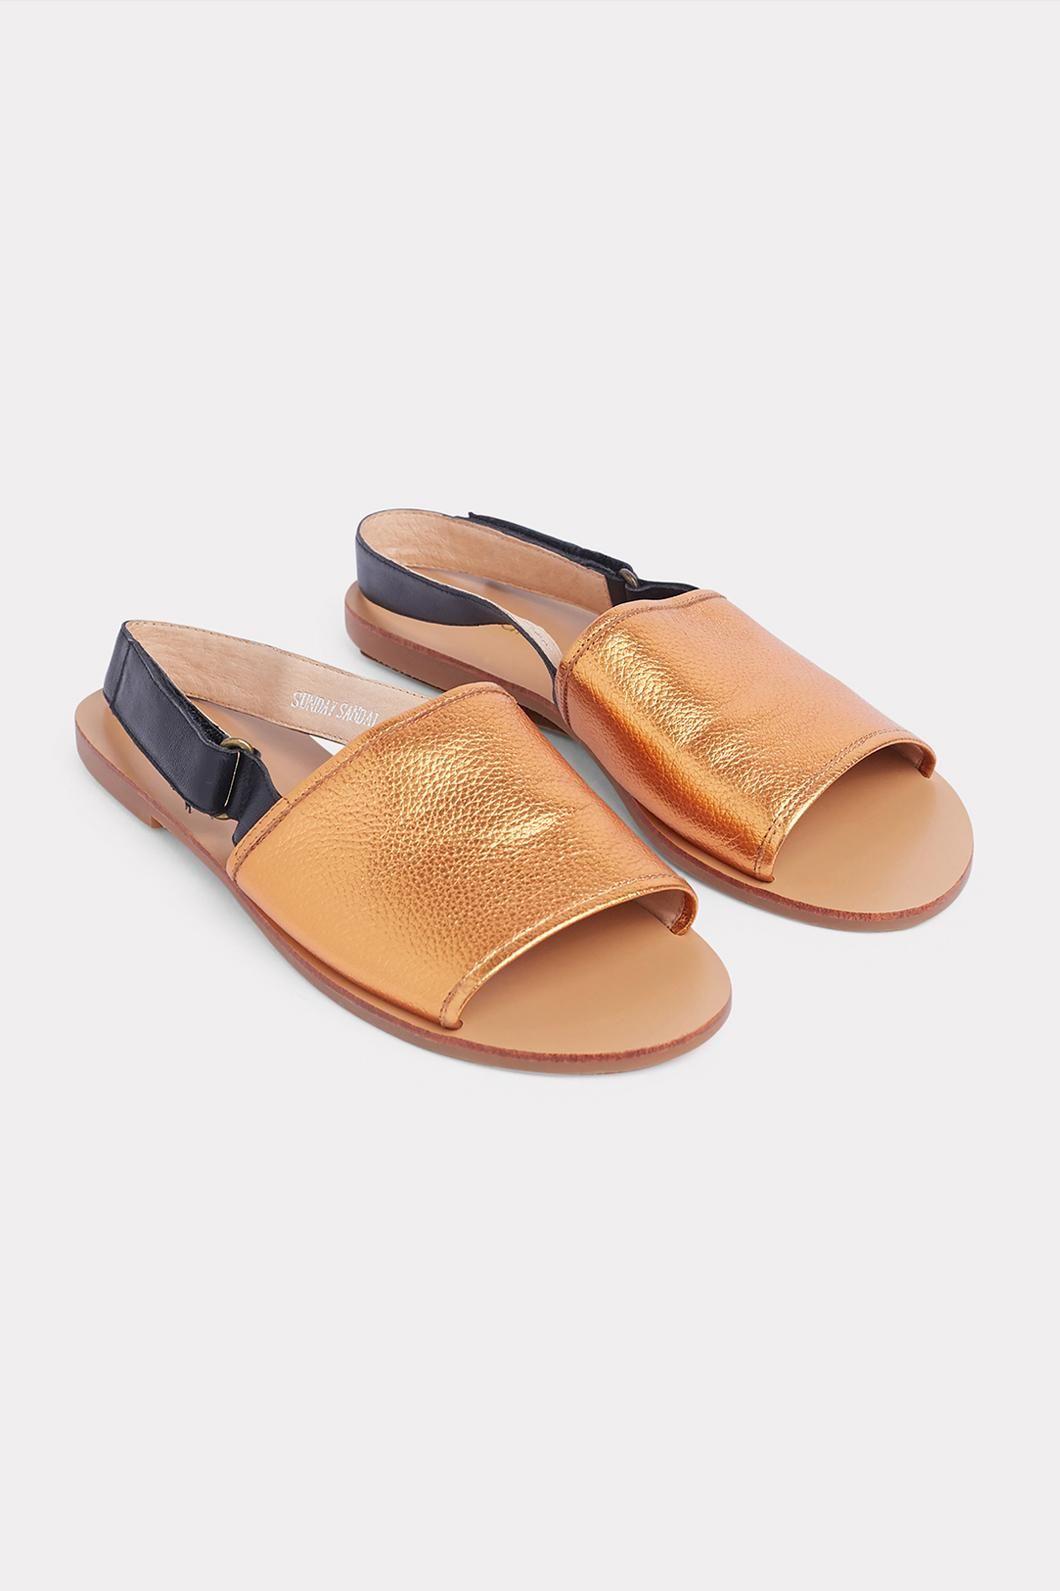 sandals on sale online